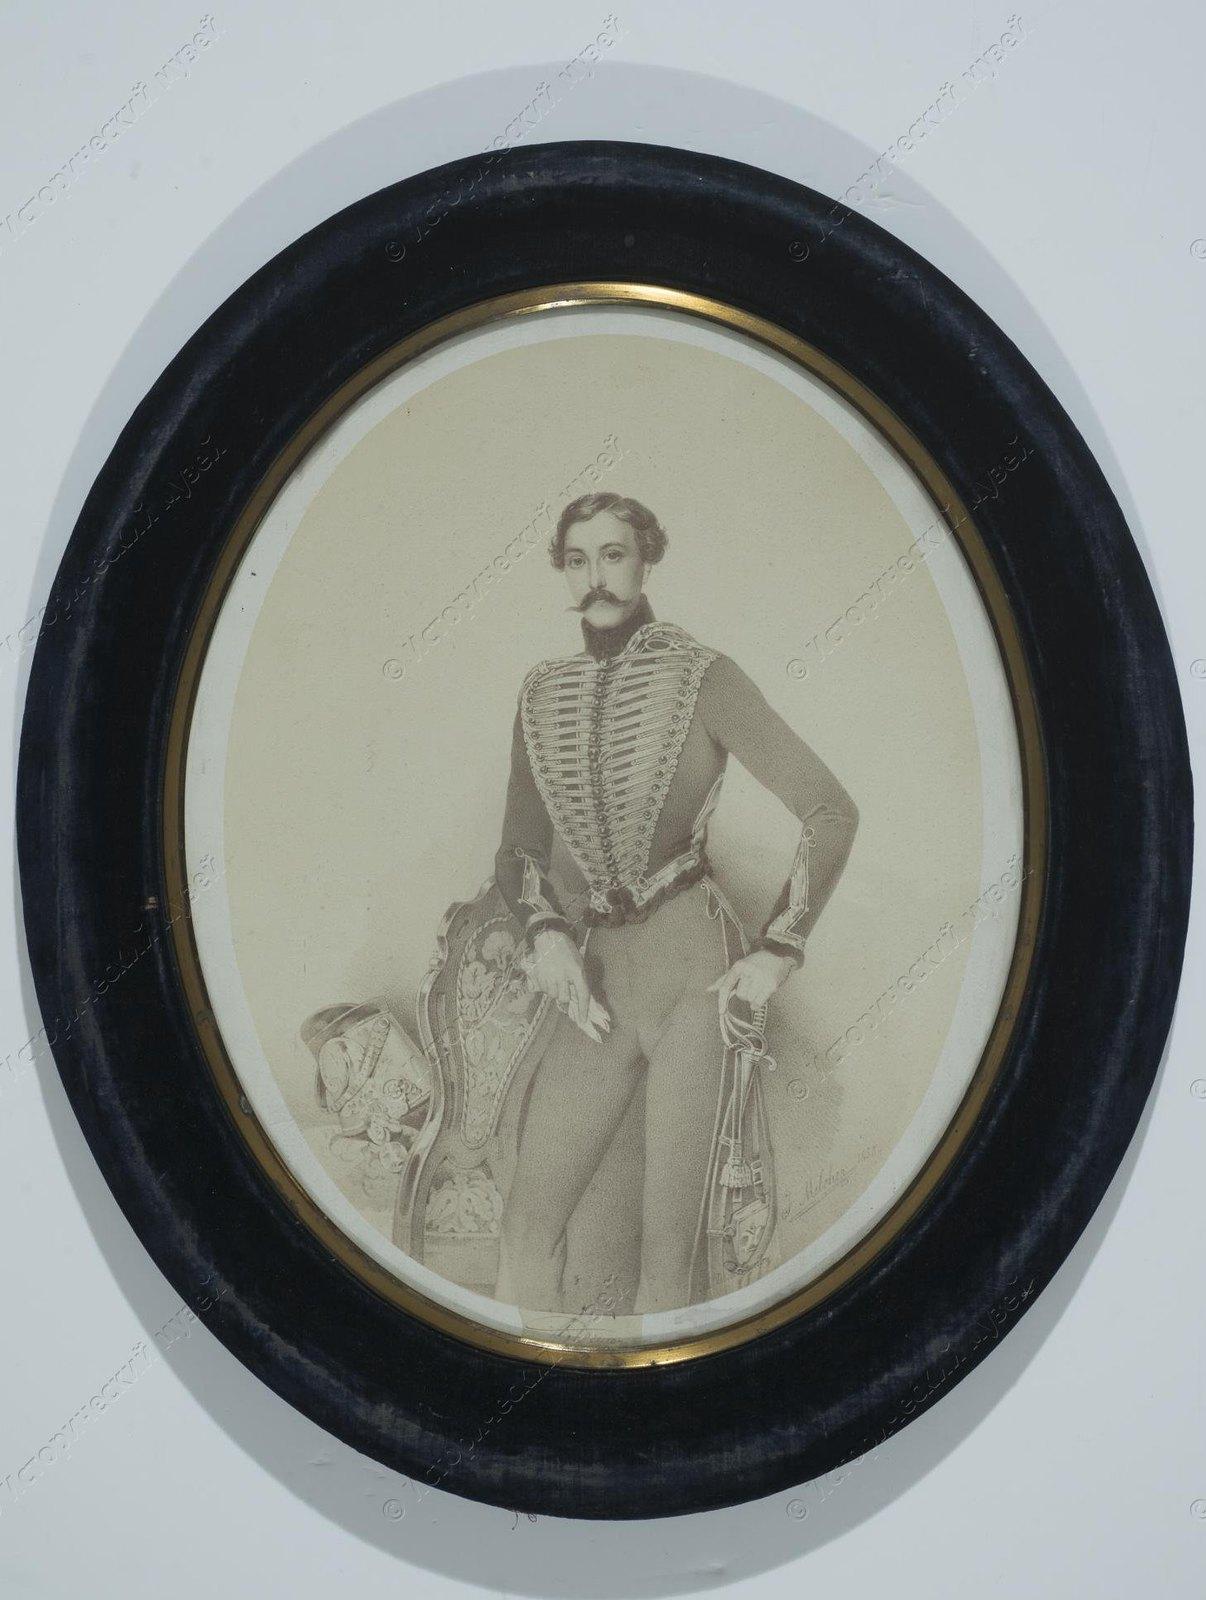 1890-е. Святополк-Четвертинский Владимир Борисович - князь. И.Г. Дьяговченко.